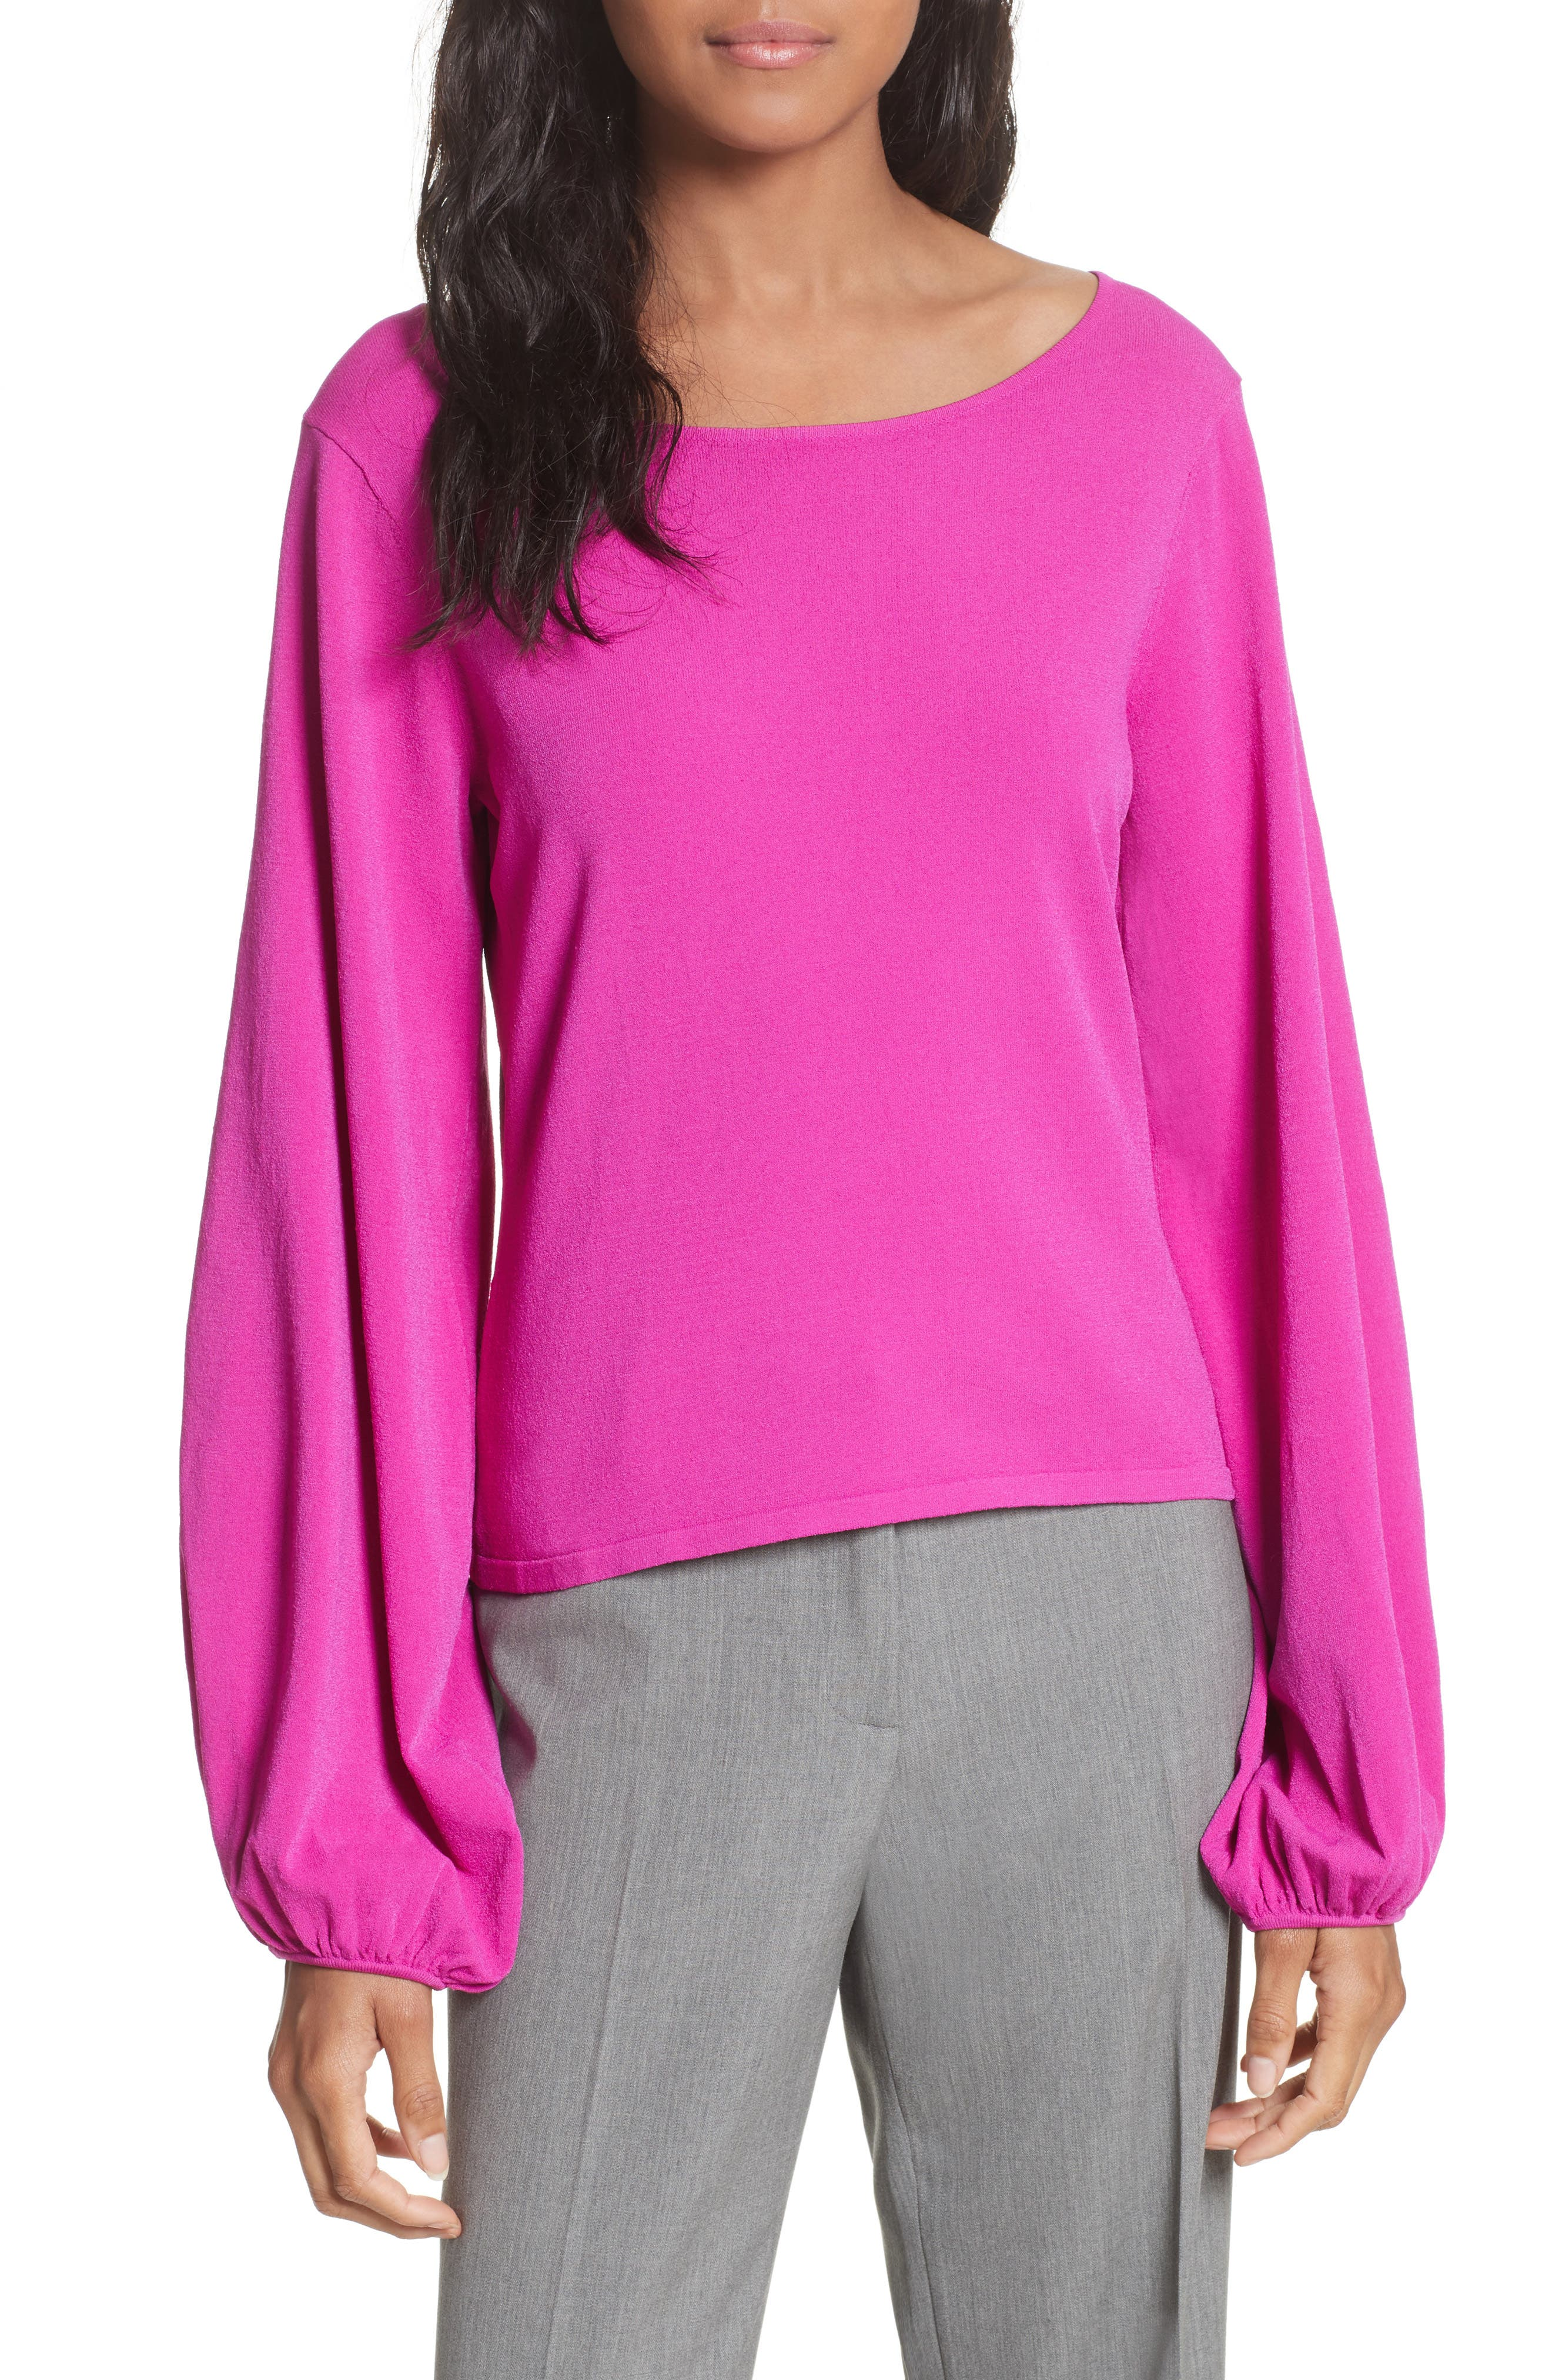 Milly Voluminous Sleeve Sweater